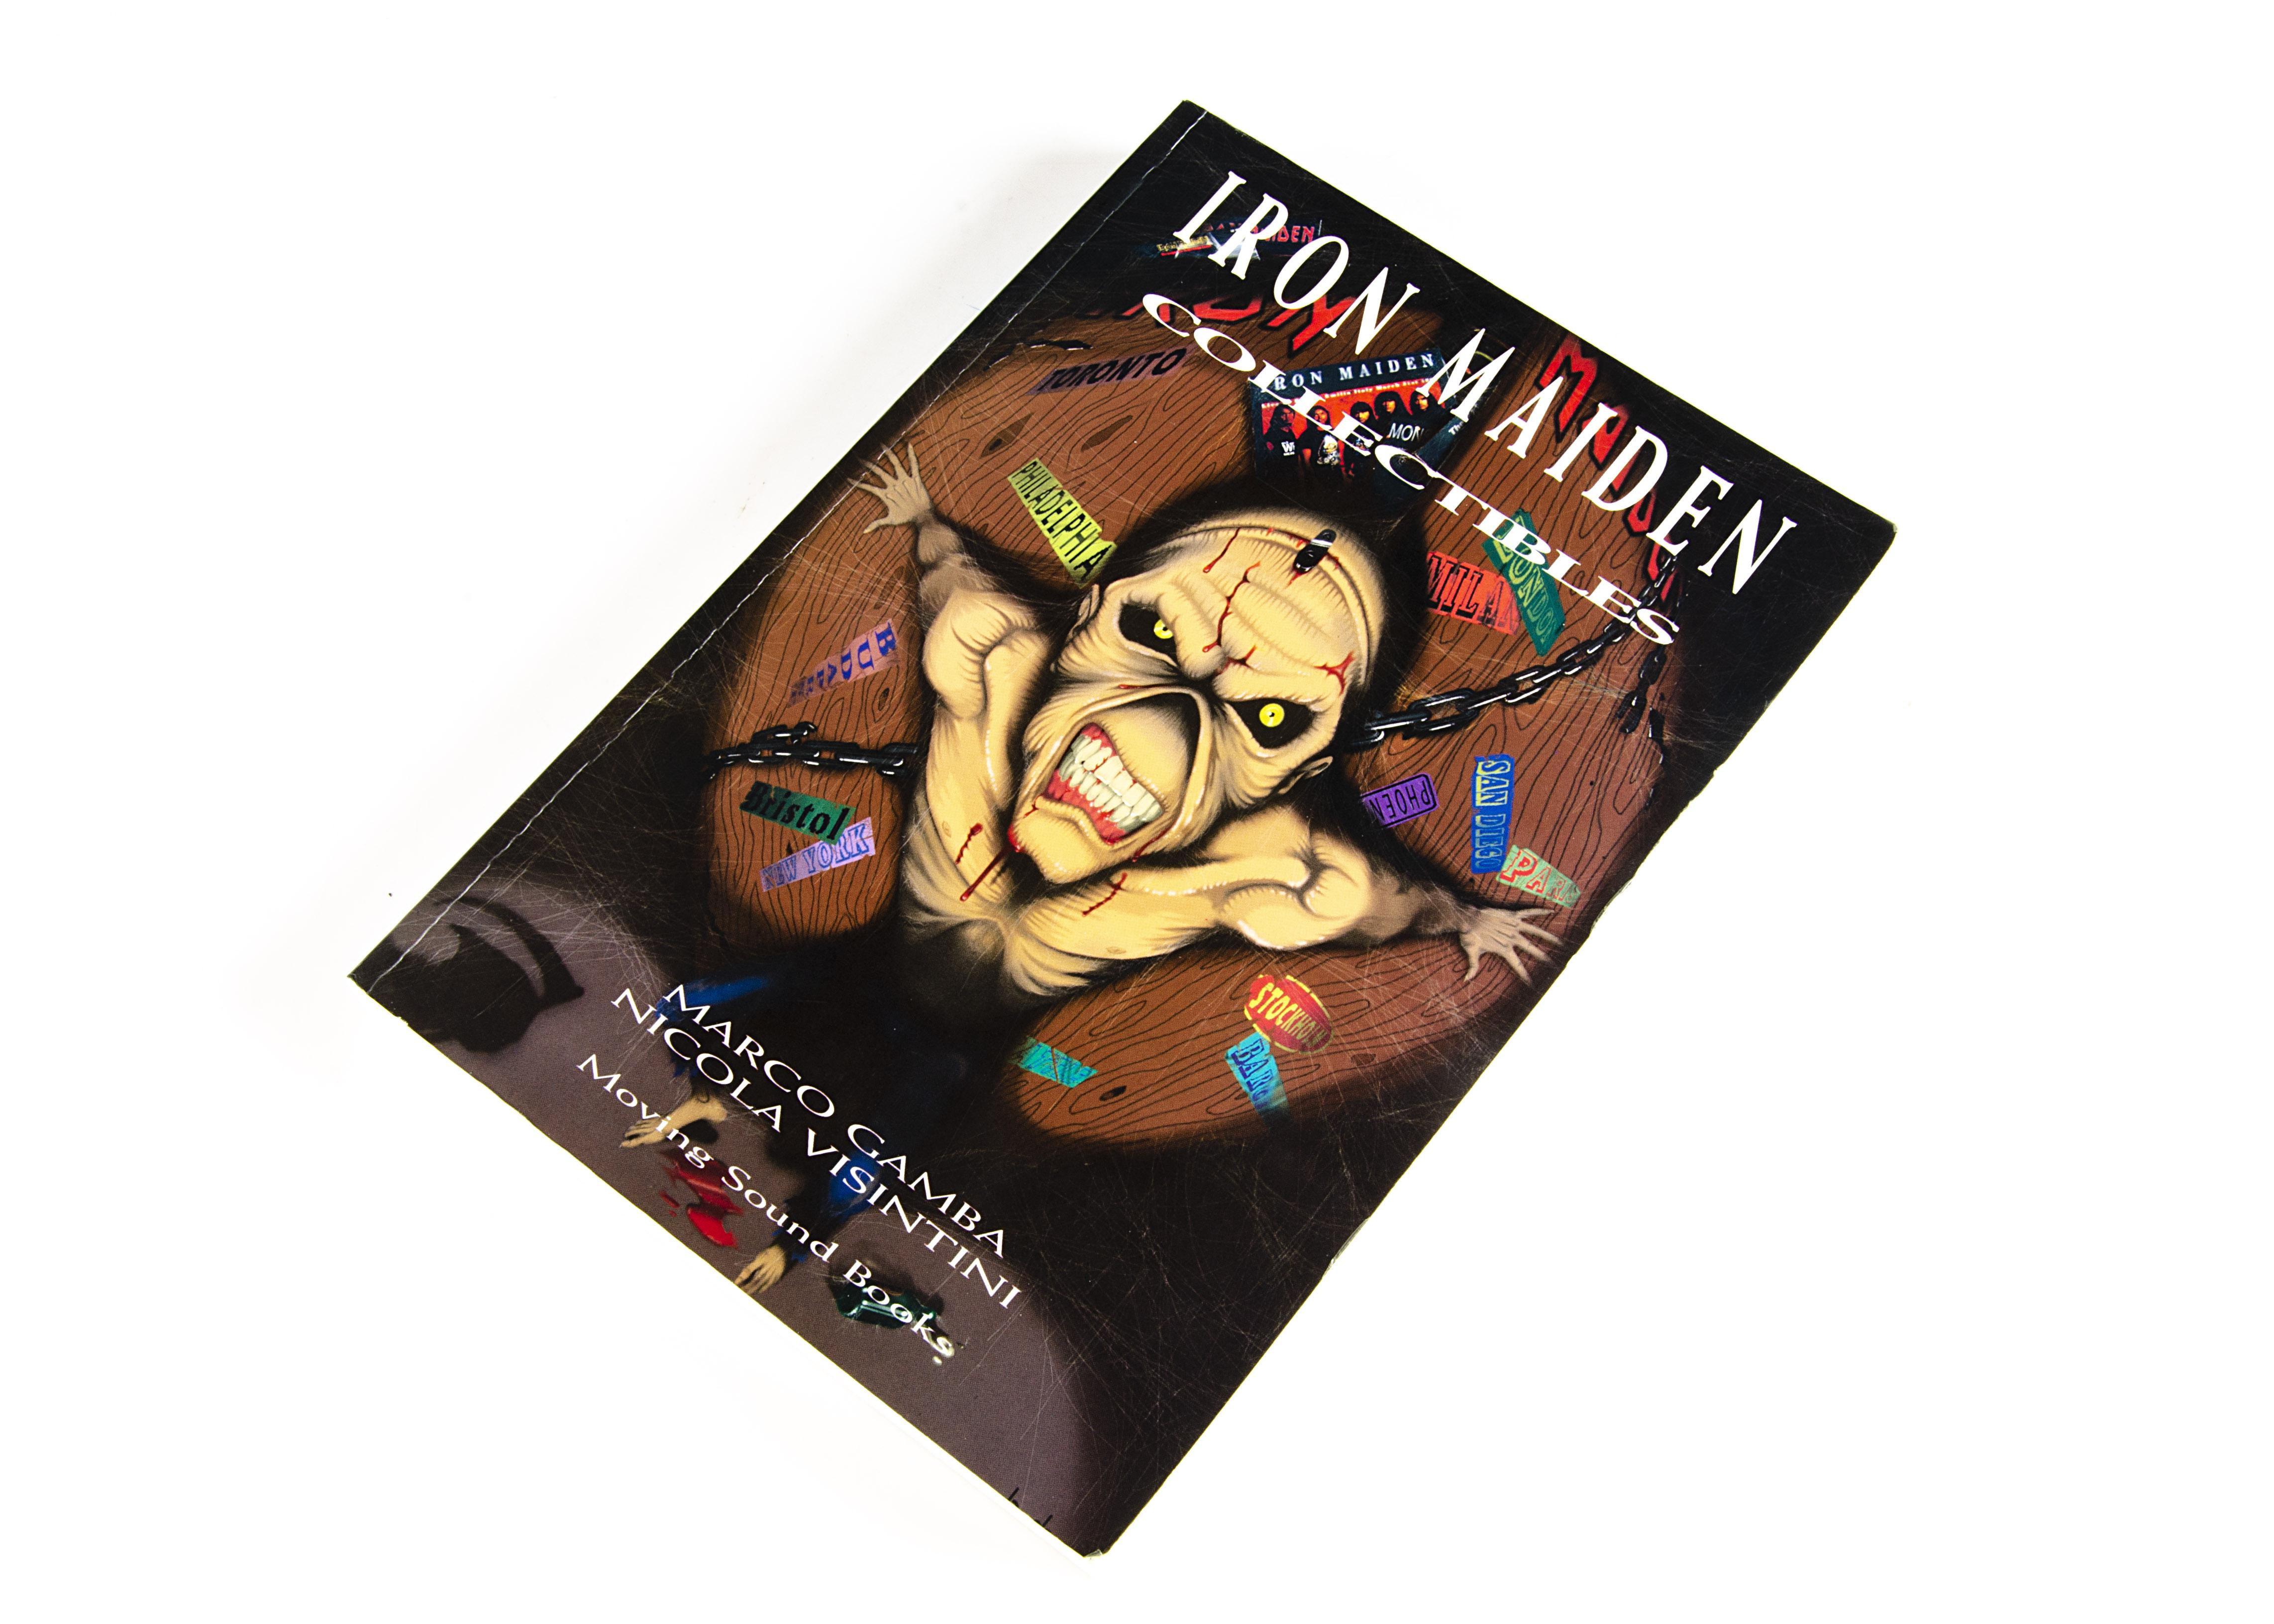 Iron Maiden Collectables Book / Signature, Iron Maiden Collectibles - softback book by Marco Gamba